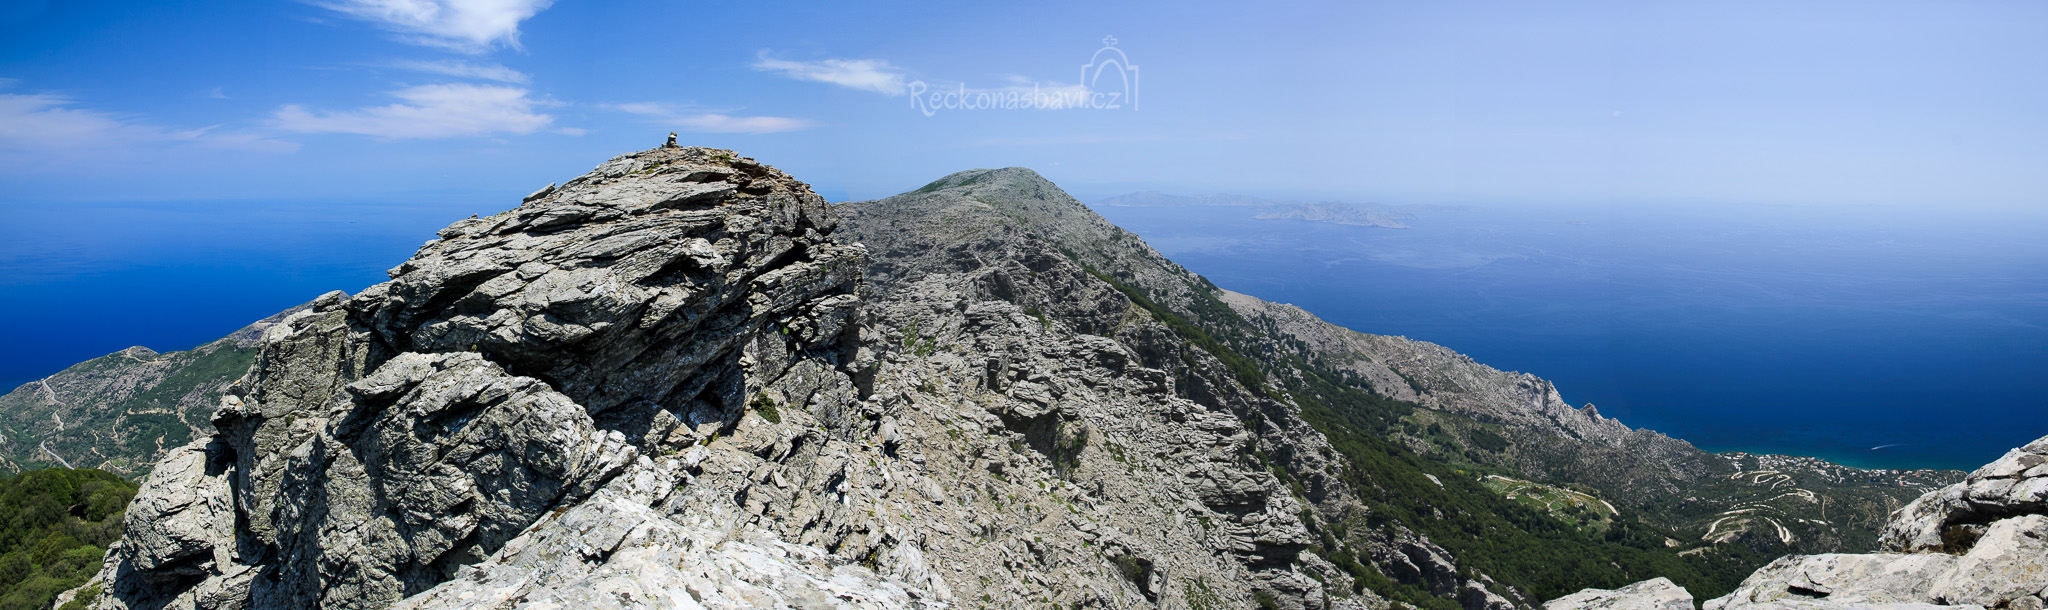 poslední kroky k vrcholu Tsolias (1021m n.m.)